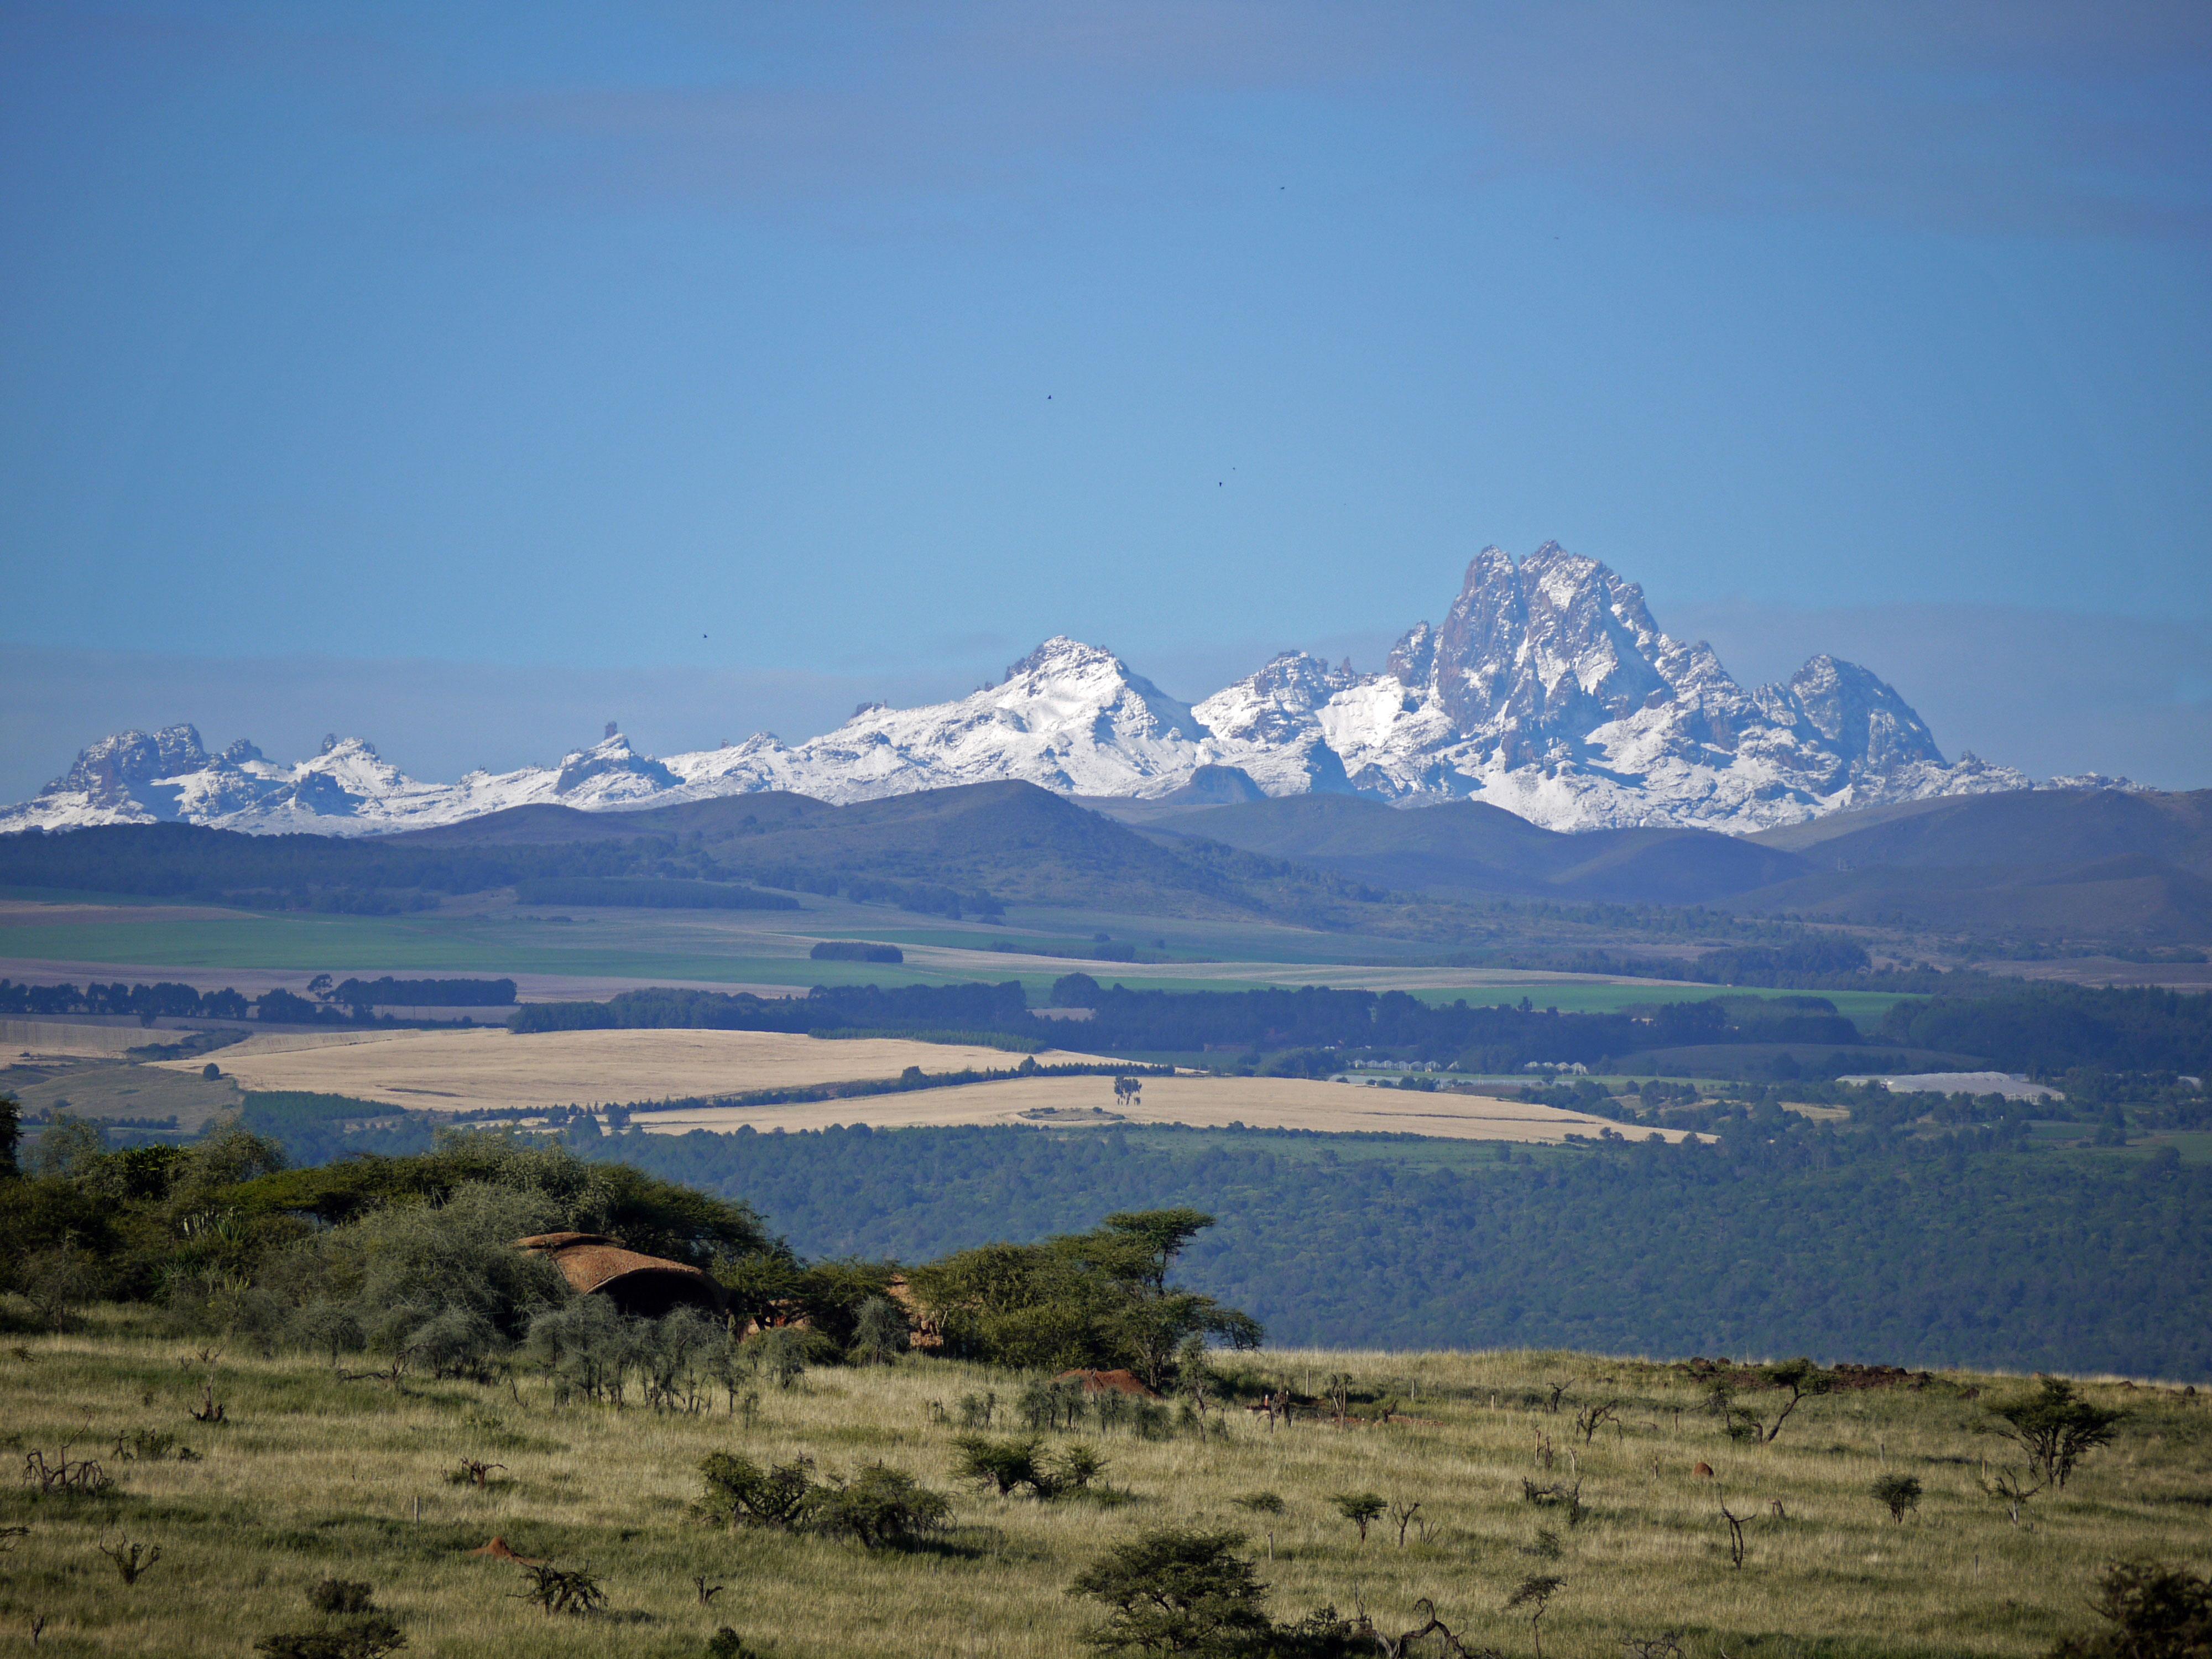 Lewa-House View Mt Kenya